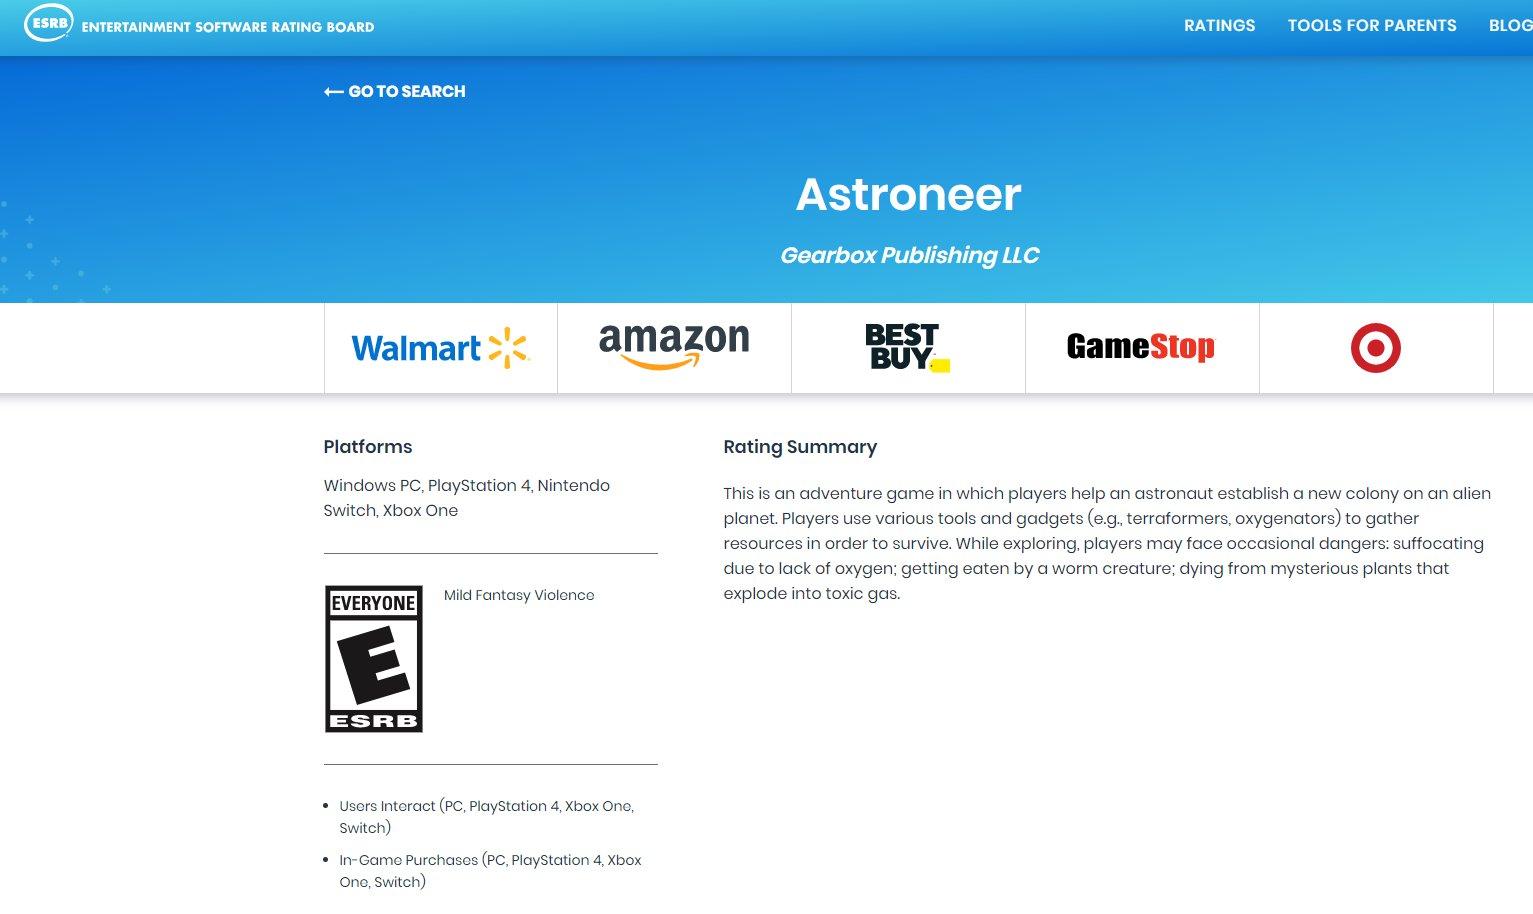 Astroneer Nintendo Switch ESRB PEGI